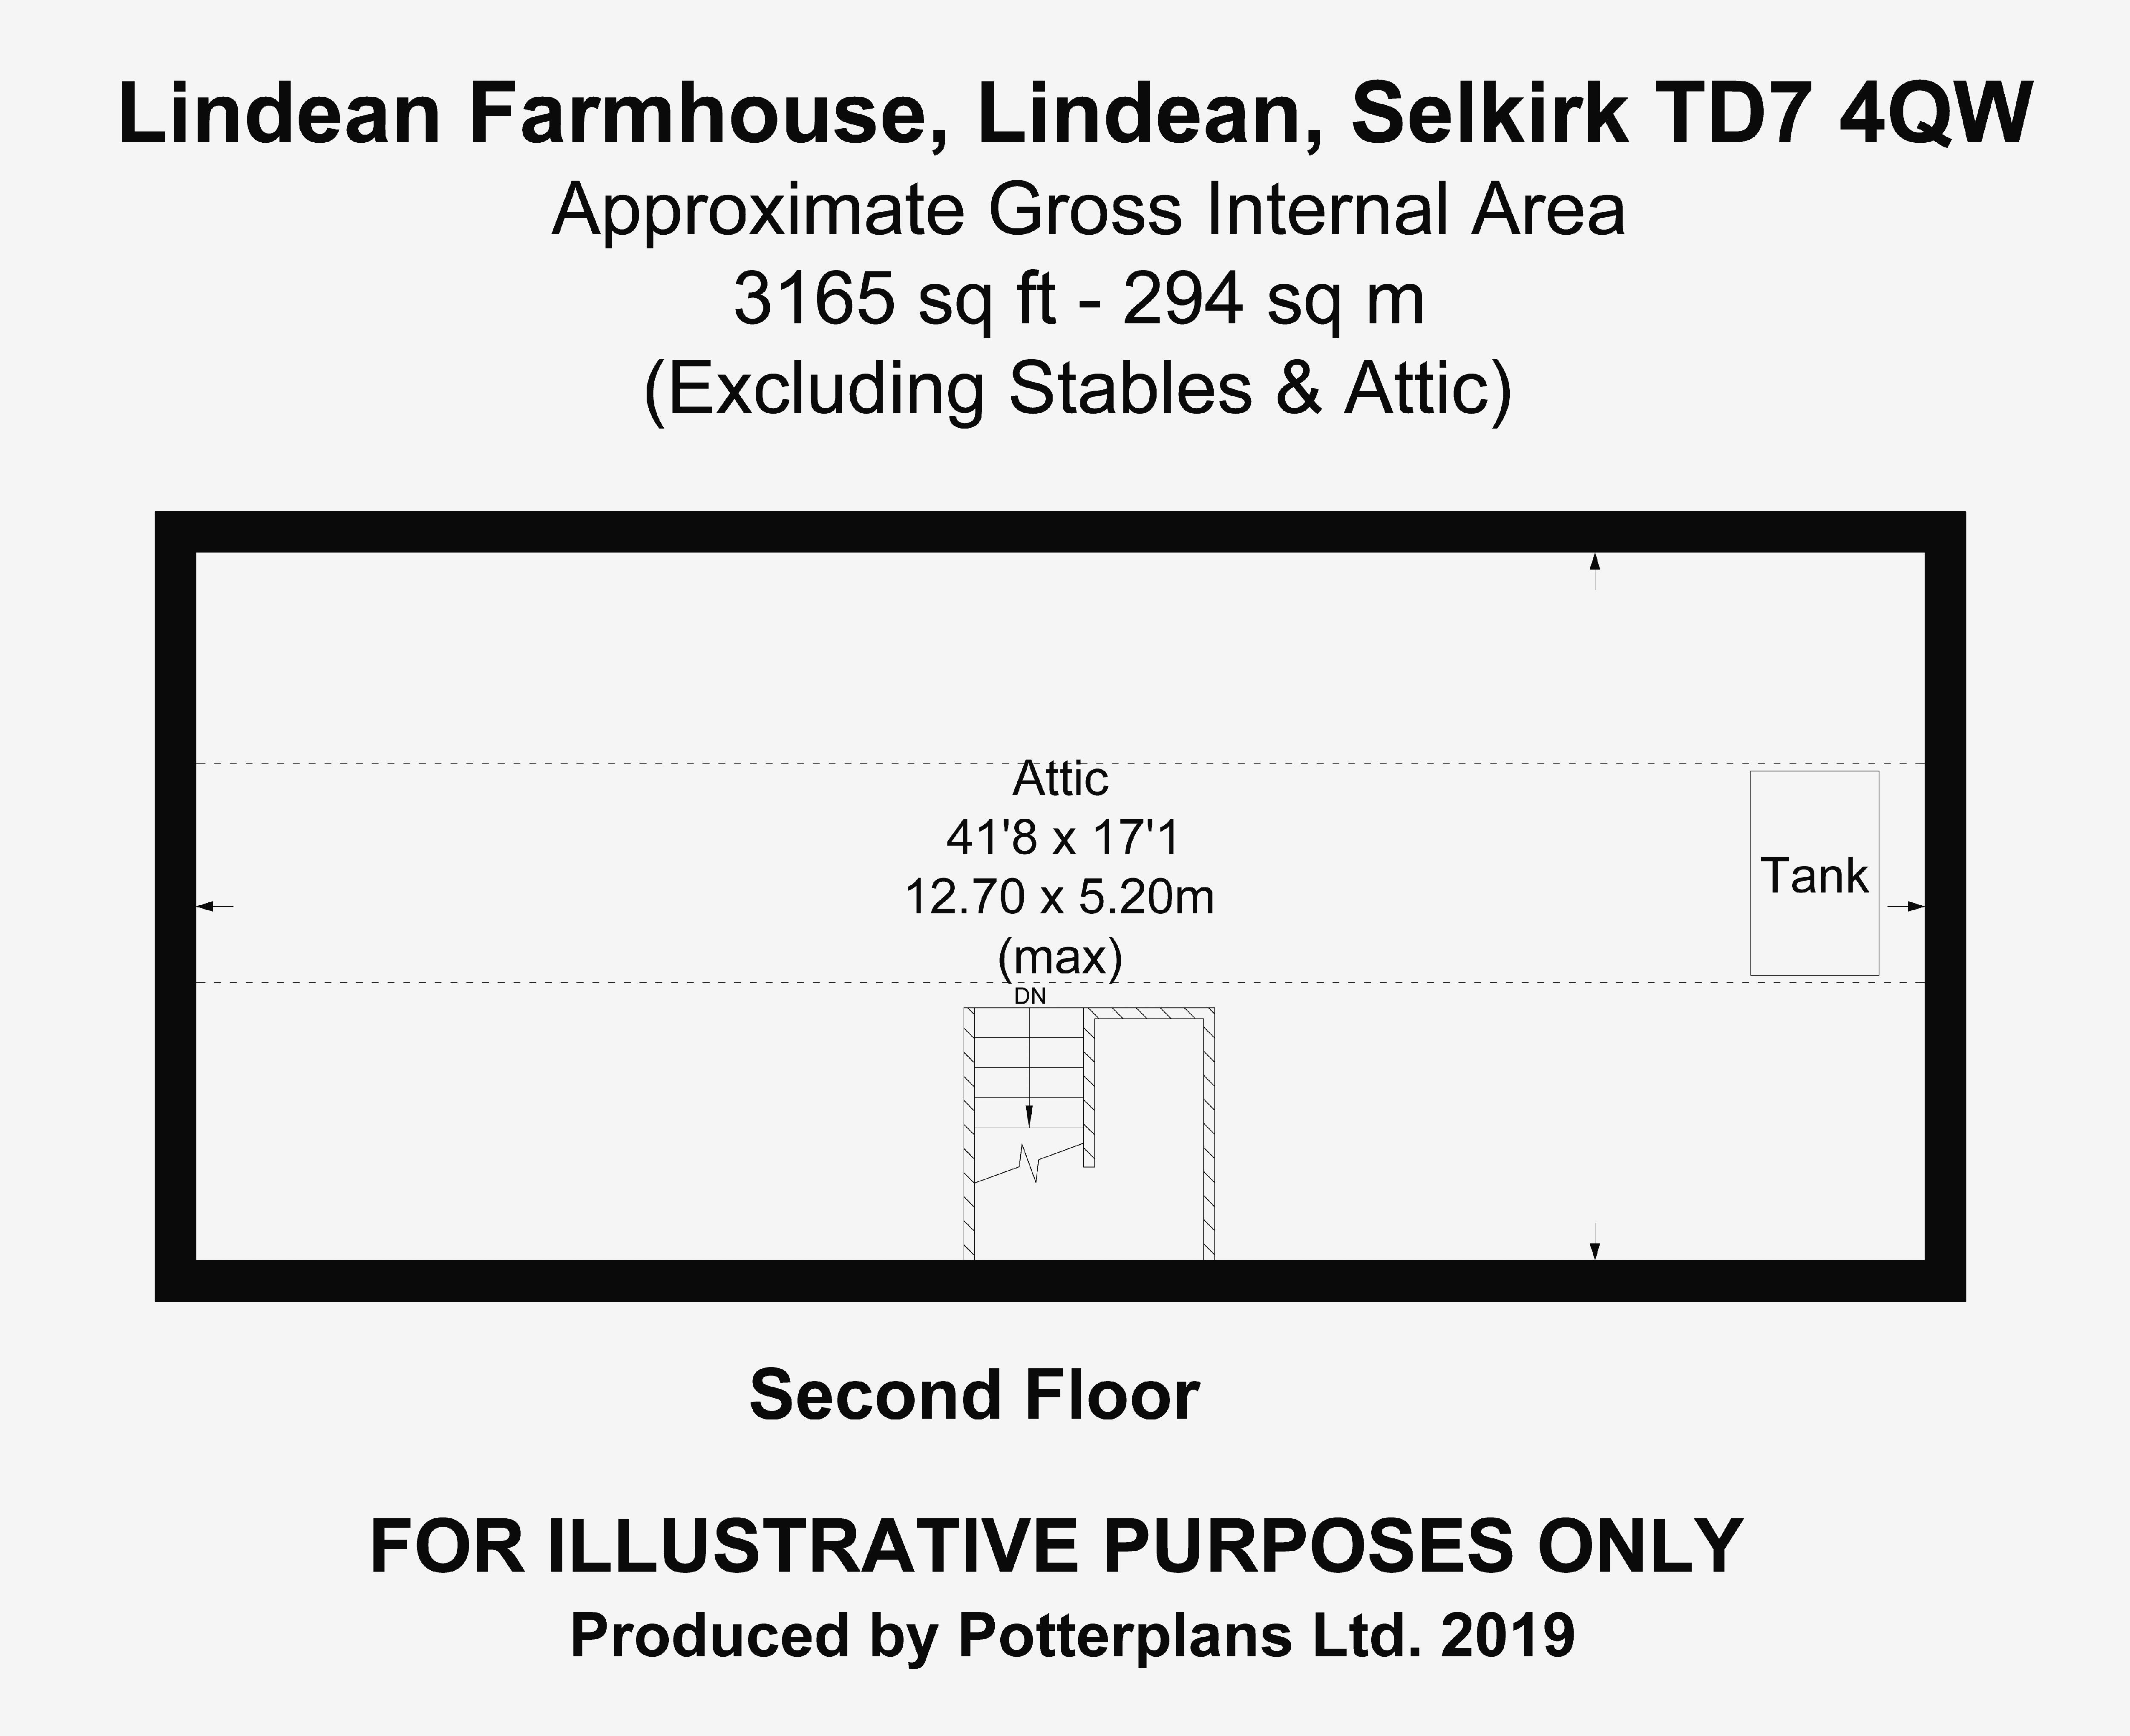 Lindean Farmhouse Attic